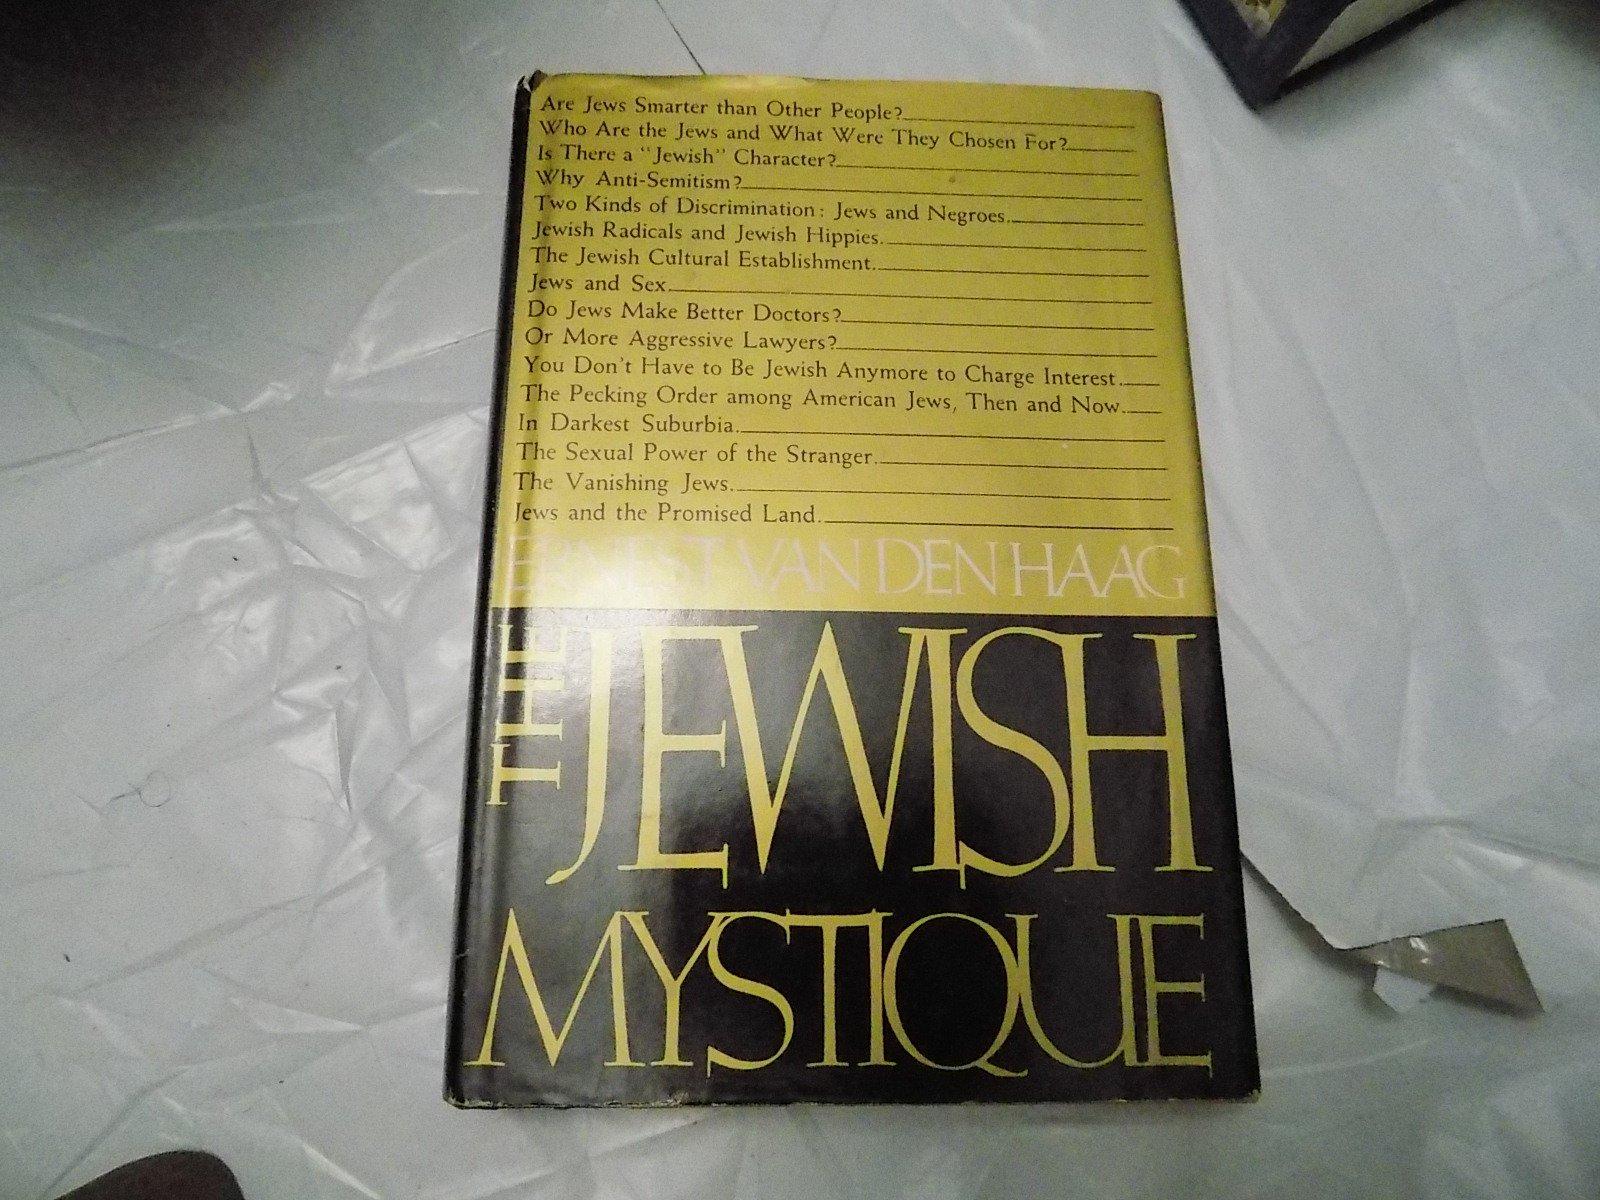 The Jewish Mystique: Ernest Van Den Haag: 9780812812671: Amazon: Books